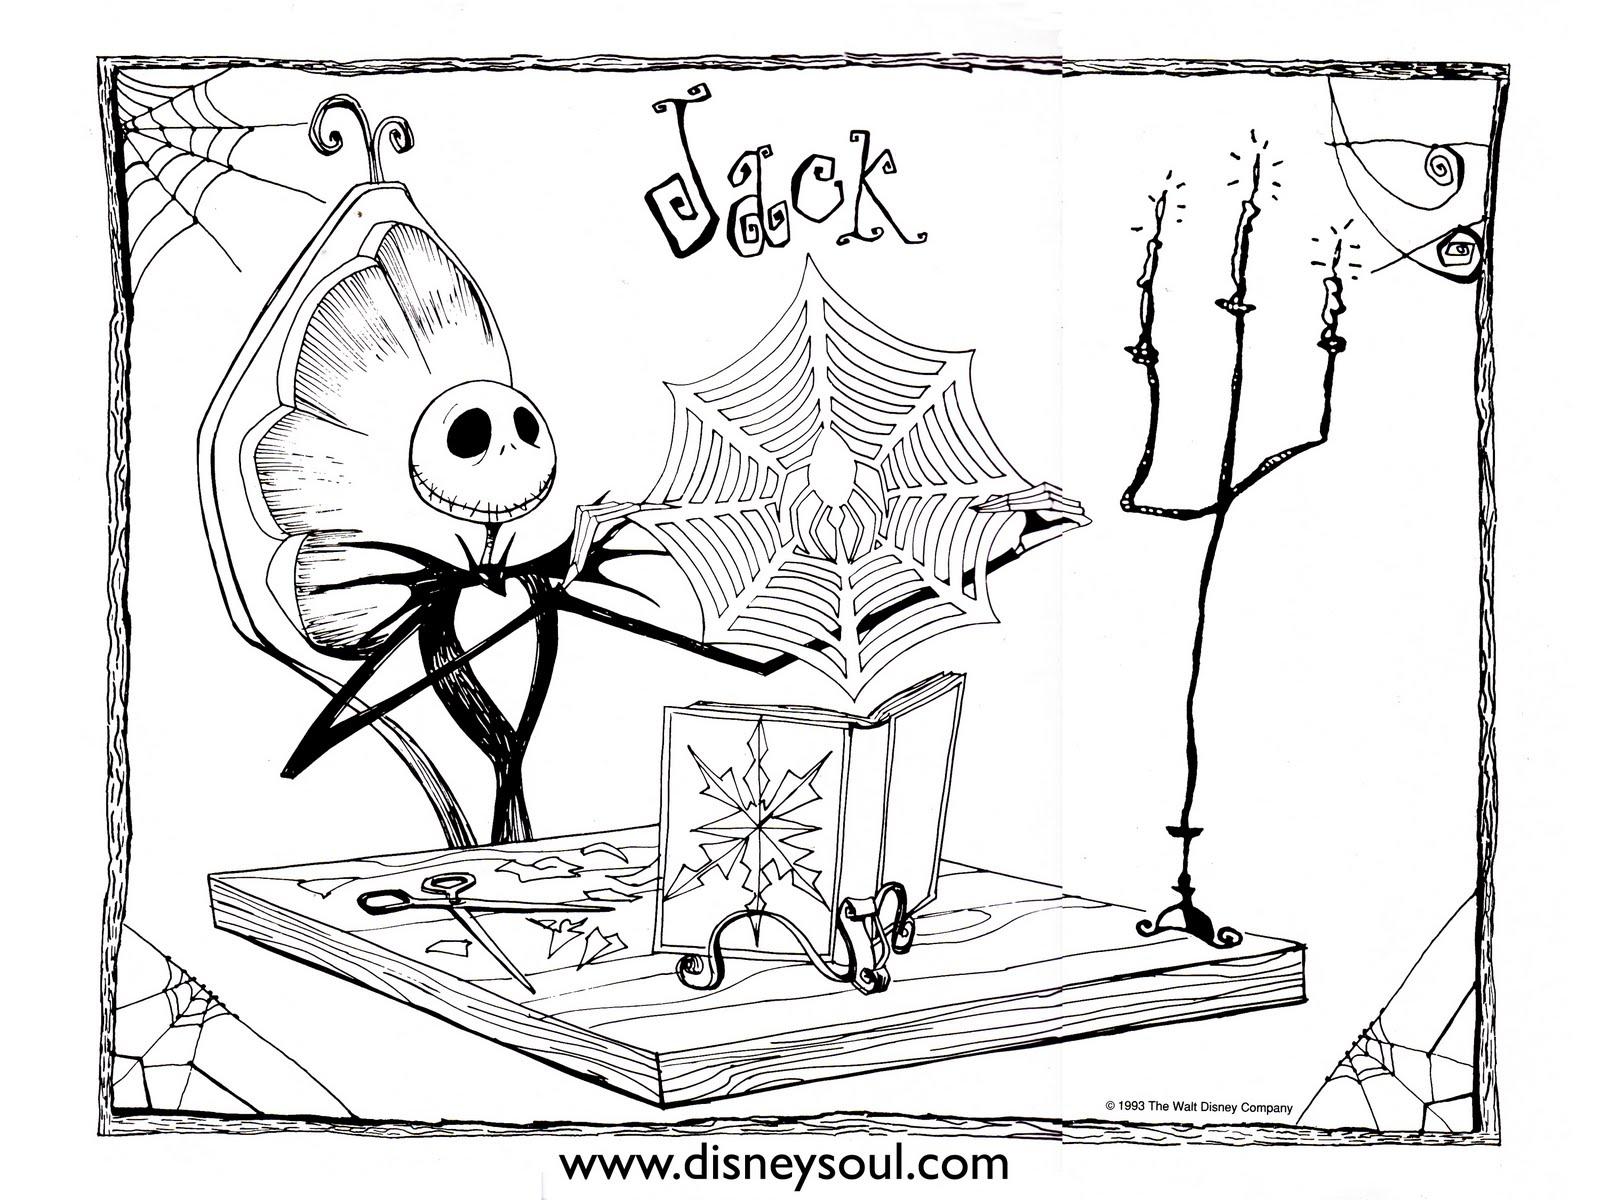 Disney Soul Dibujos para colorear de quot Pesadilla antes de